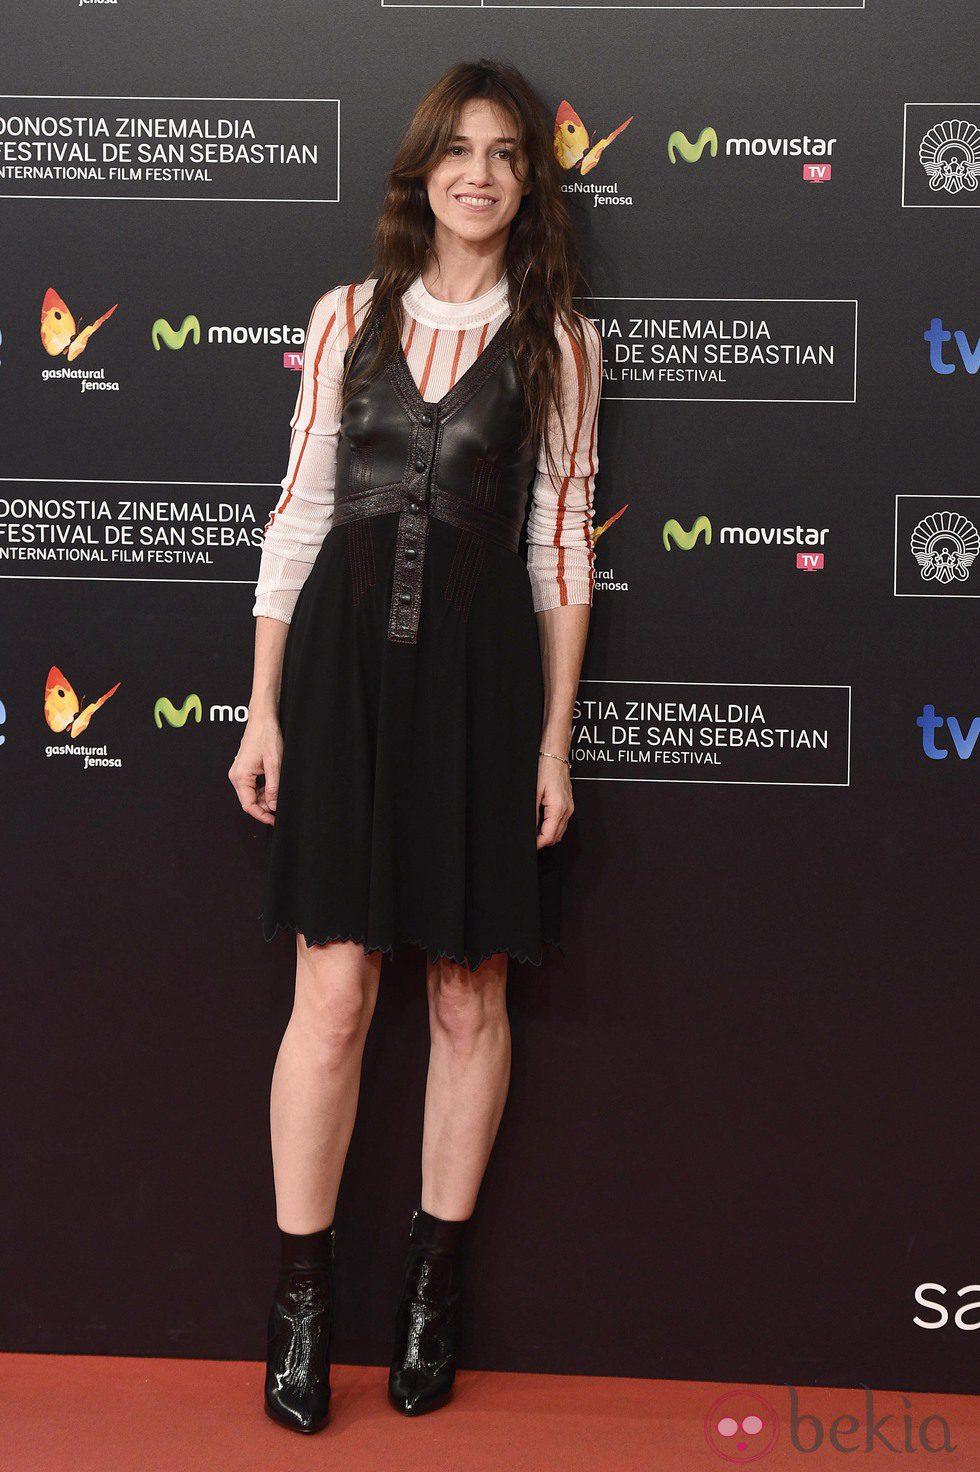 Charlotte Gainsbourg en la gala de clausura del Festival de San Sebastián 2014